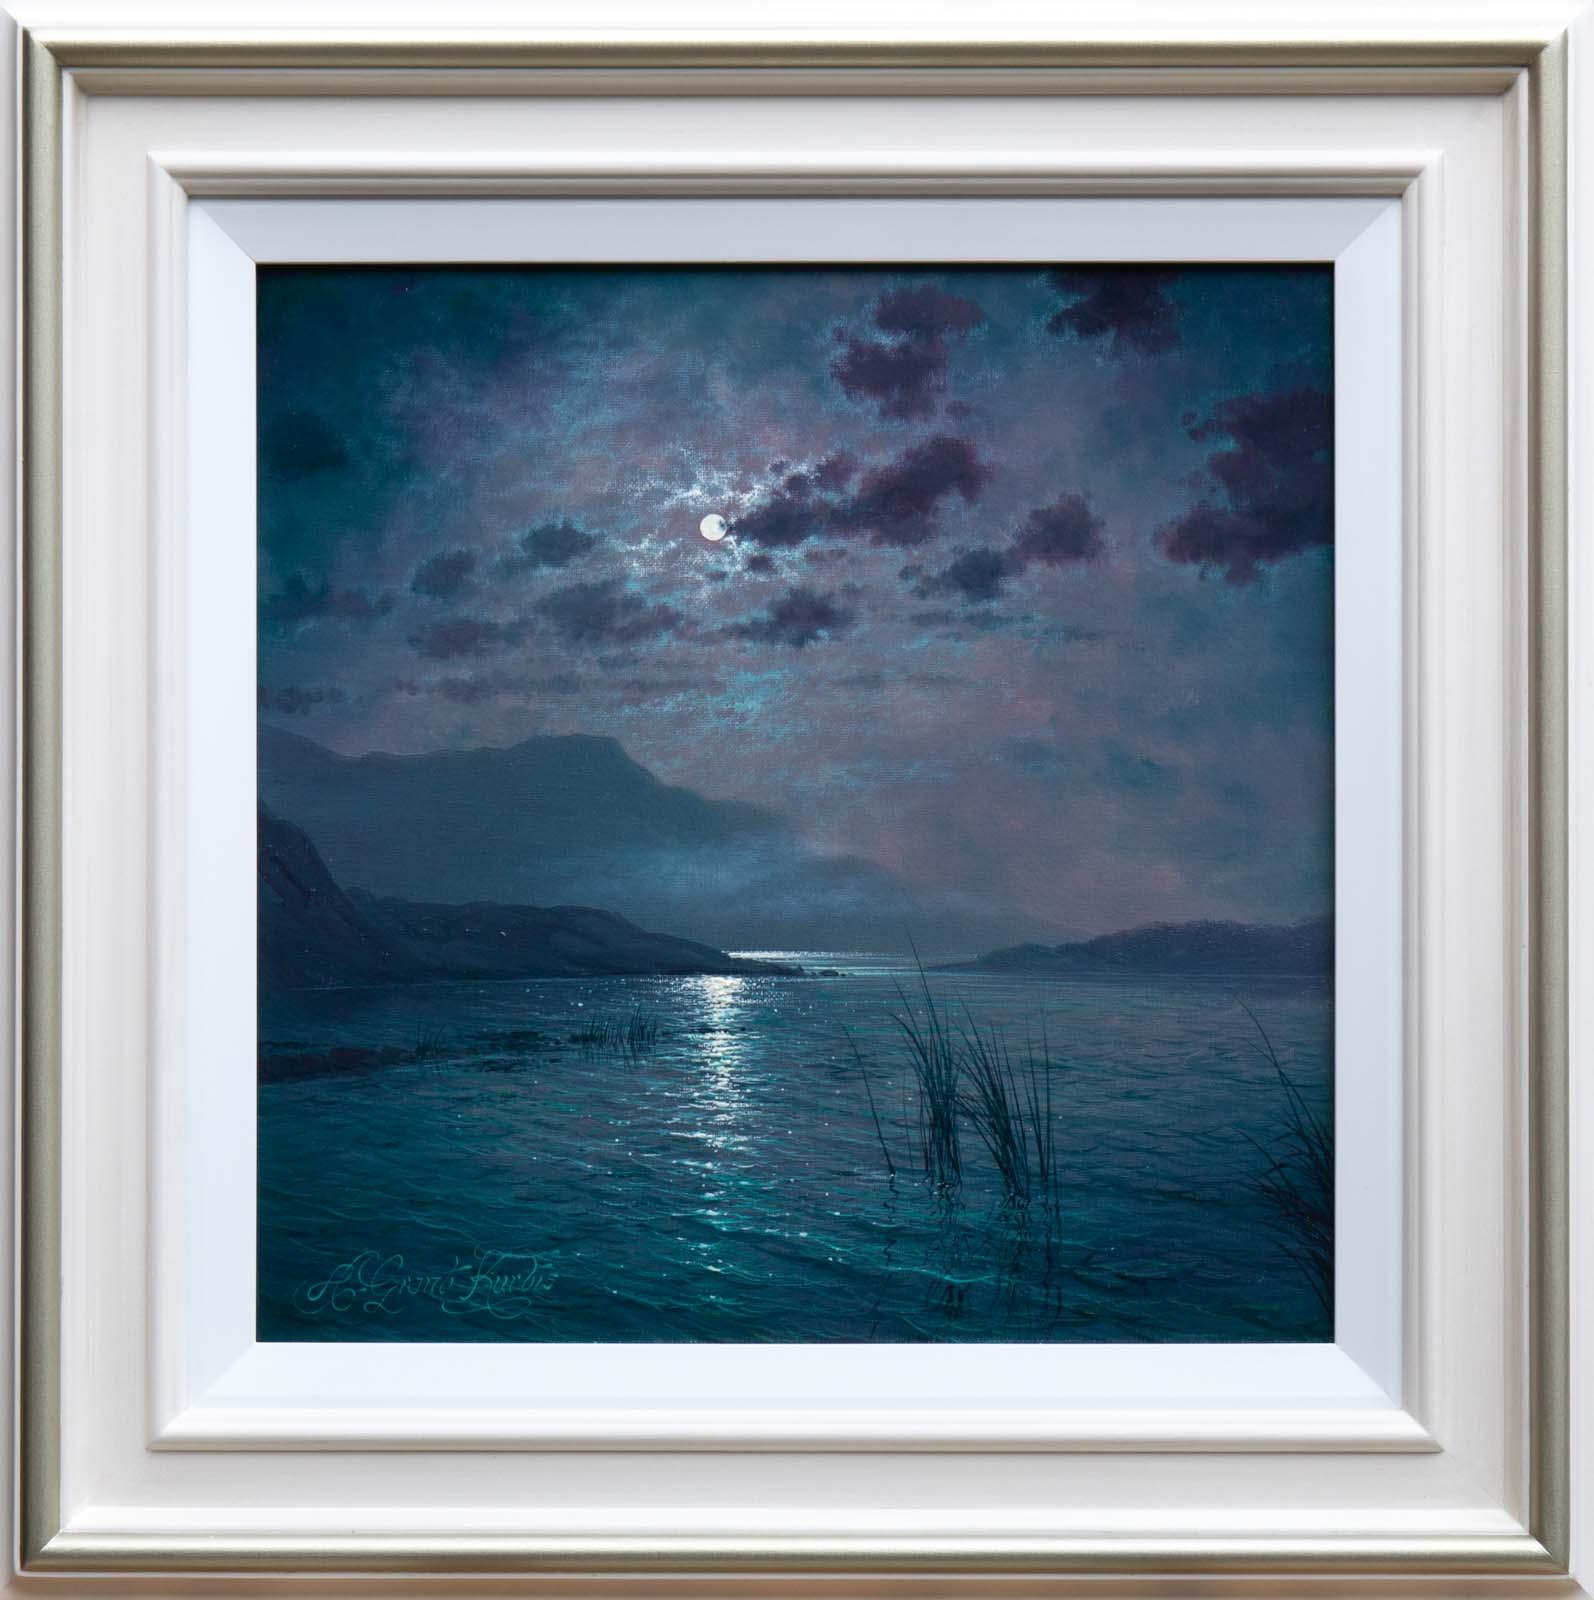 Lakeland Sparkle, Andrew Grant Kurtis